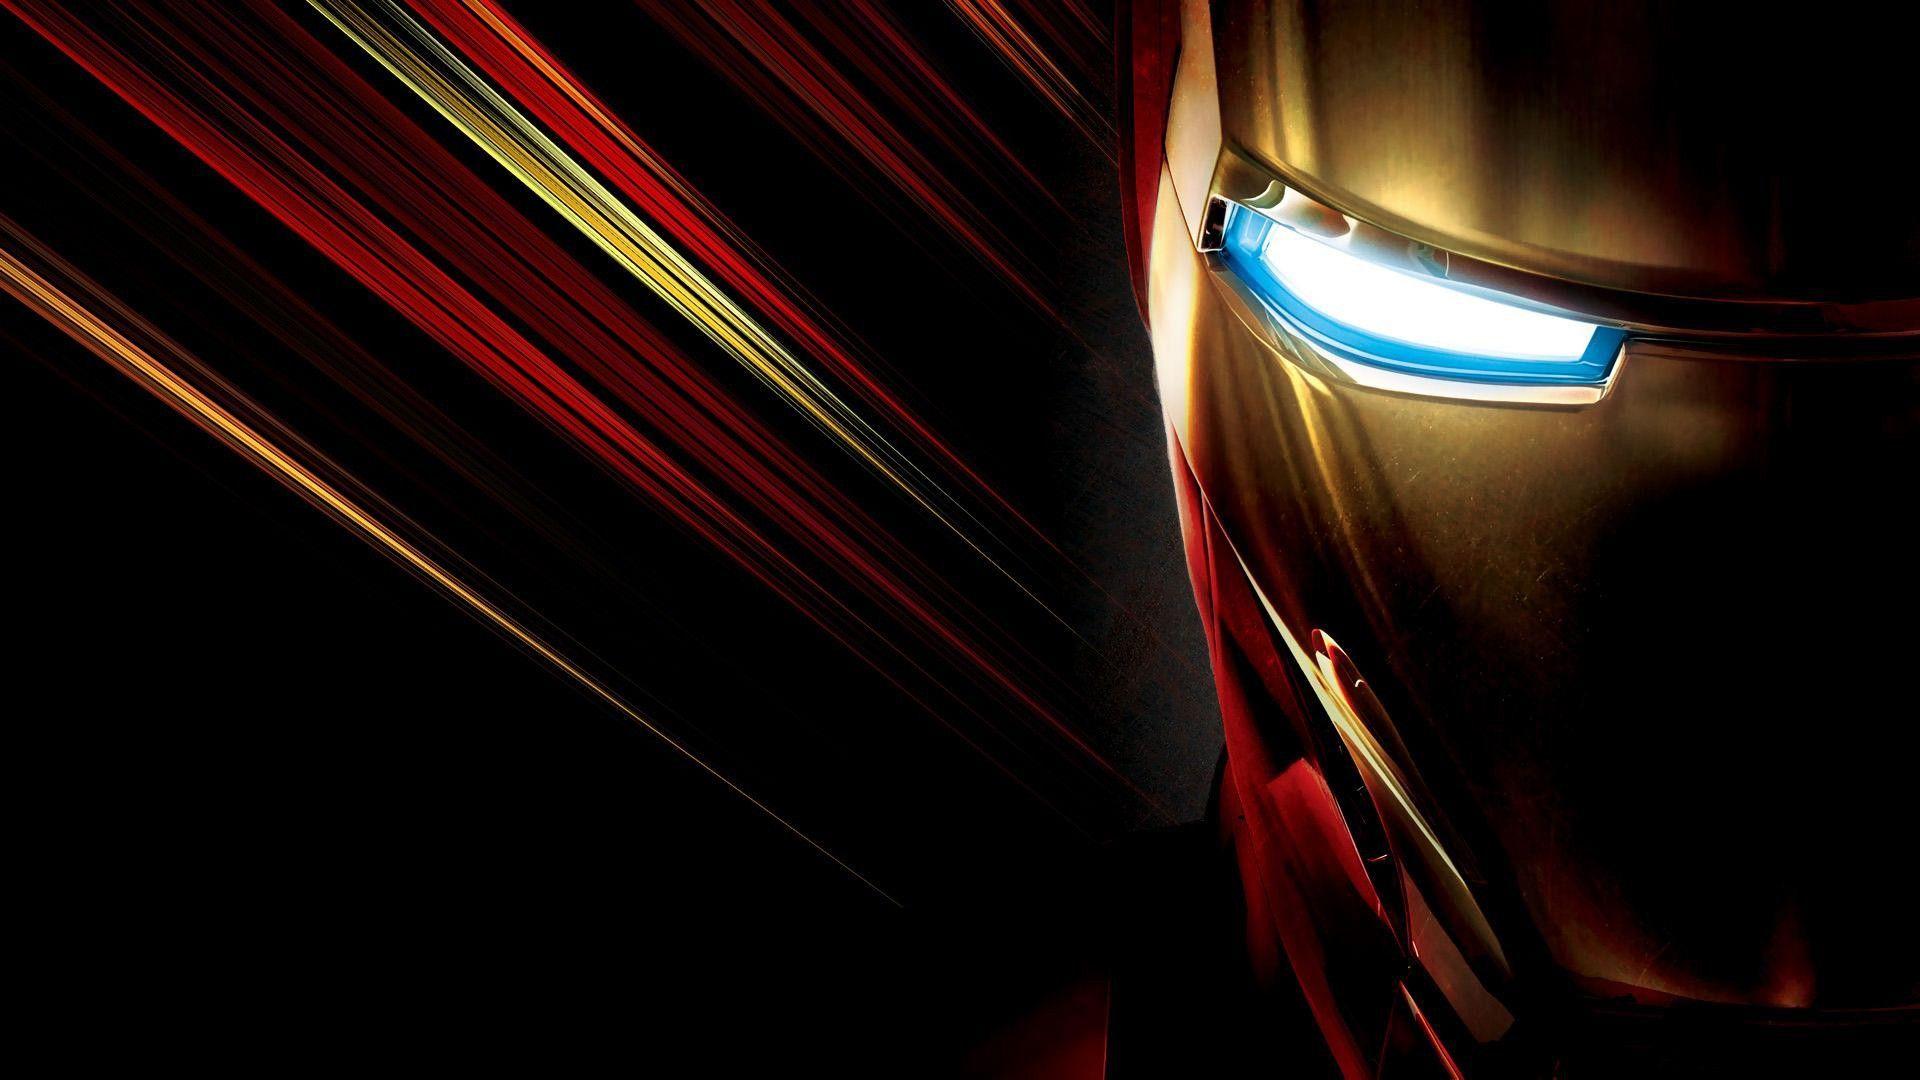 146 iron man hd